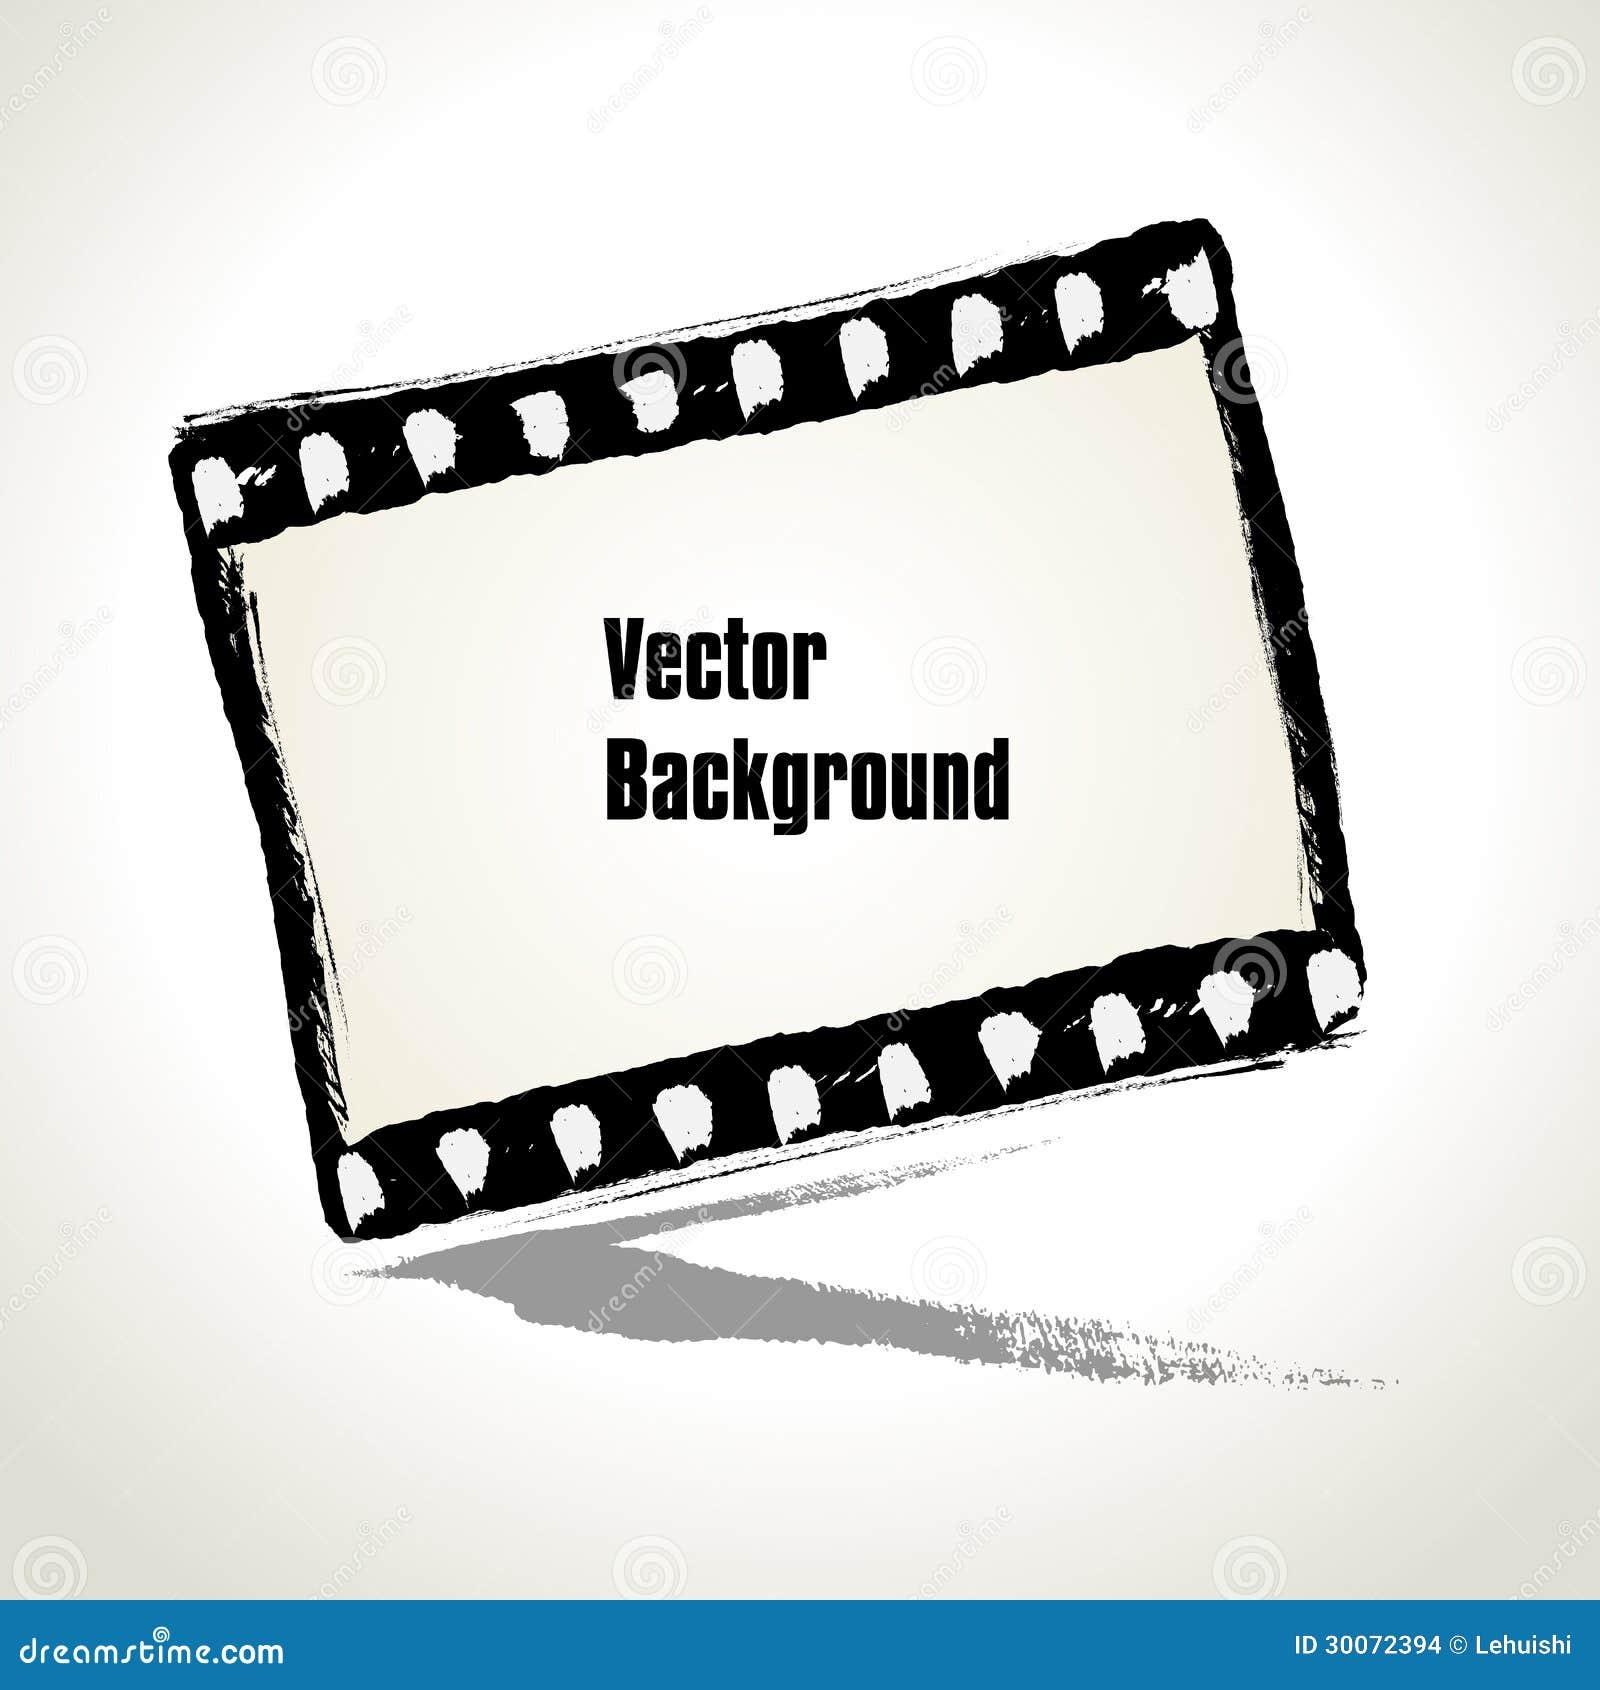 Вектор: Постаретая иллюстрация рамки filmstrip grunge.